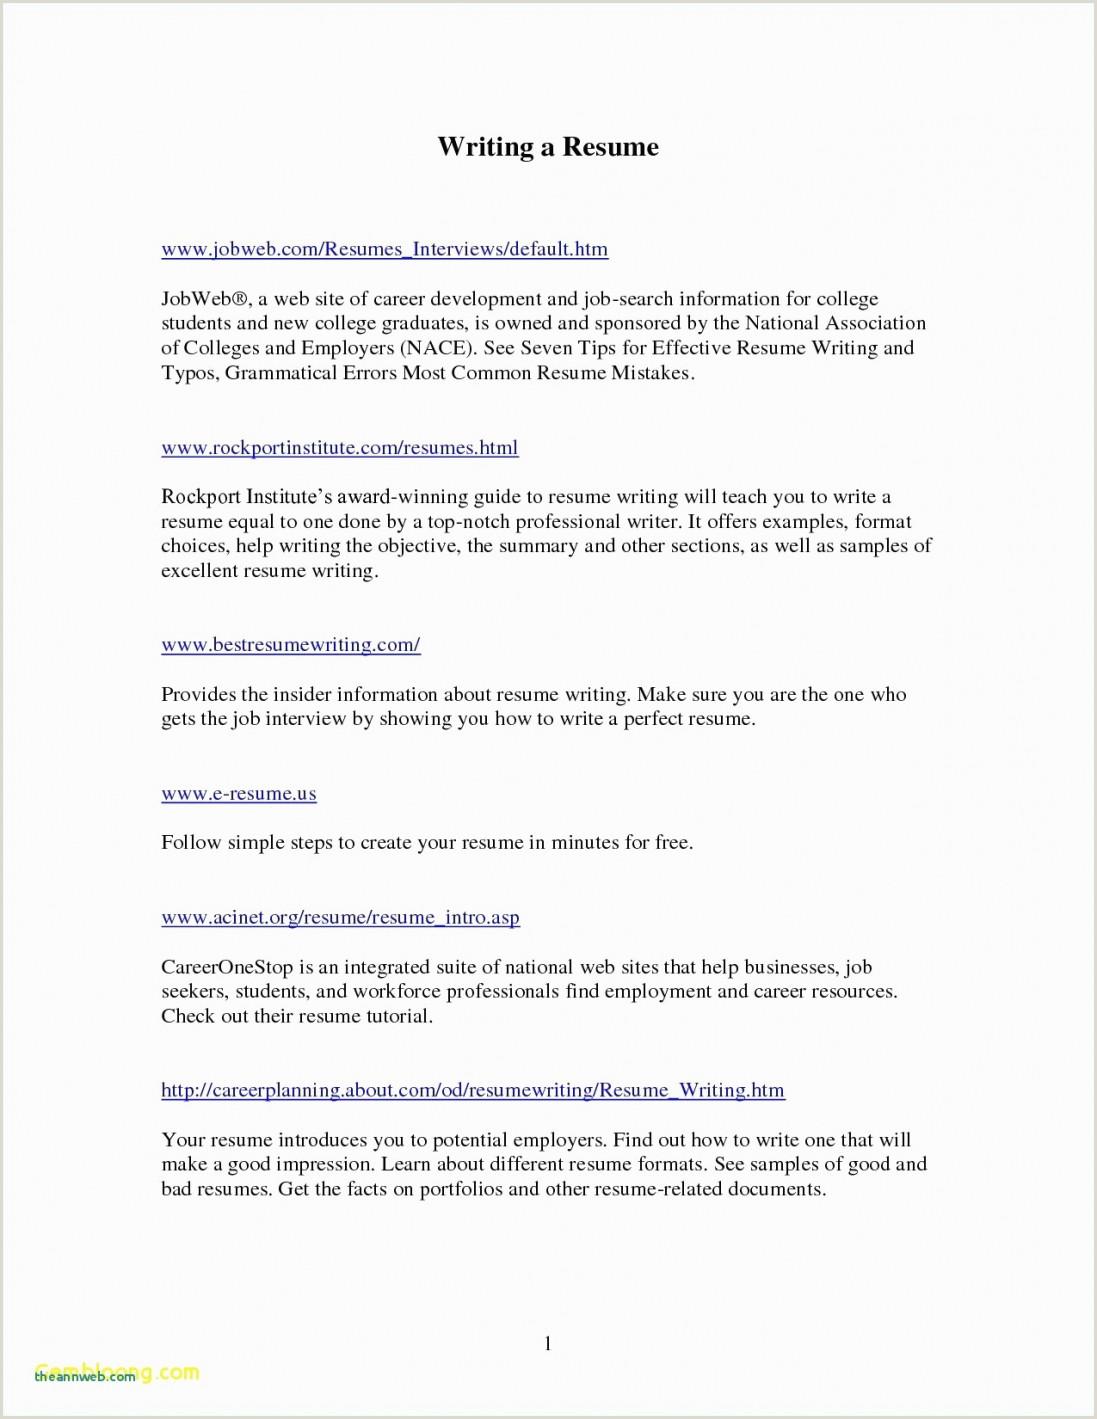 Standard format for Cv Pdf Teaching Resume Sample Pdf Valid Cv Resume Template